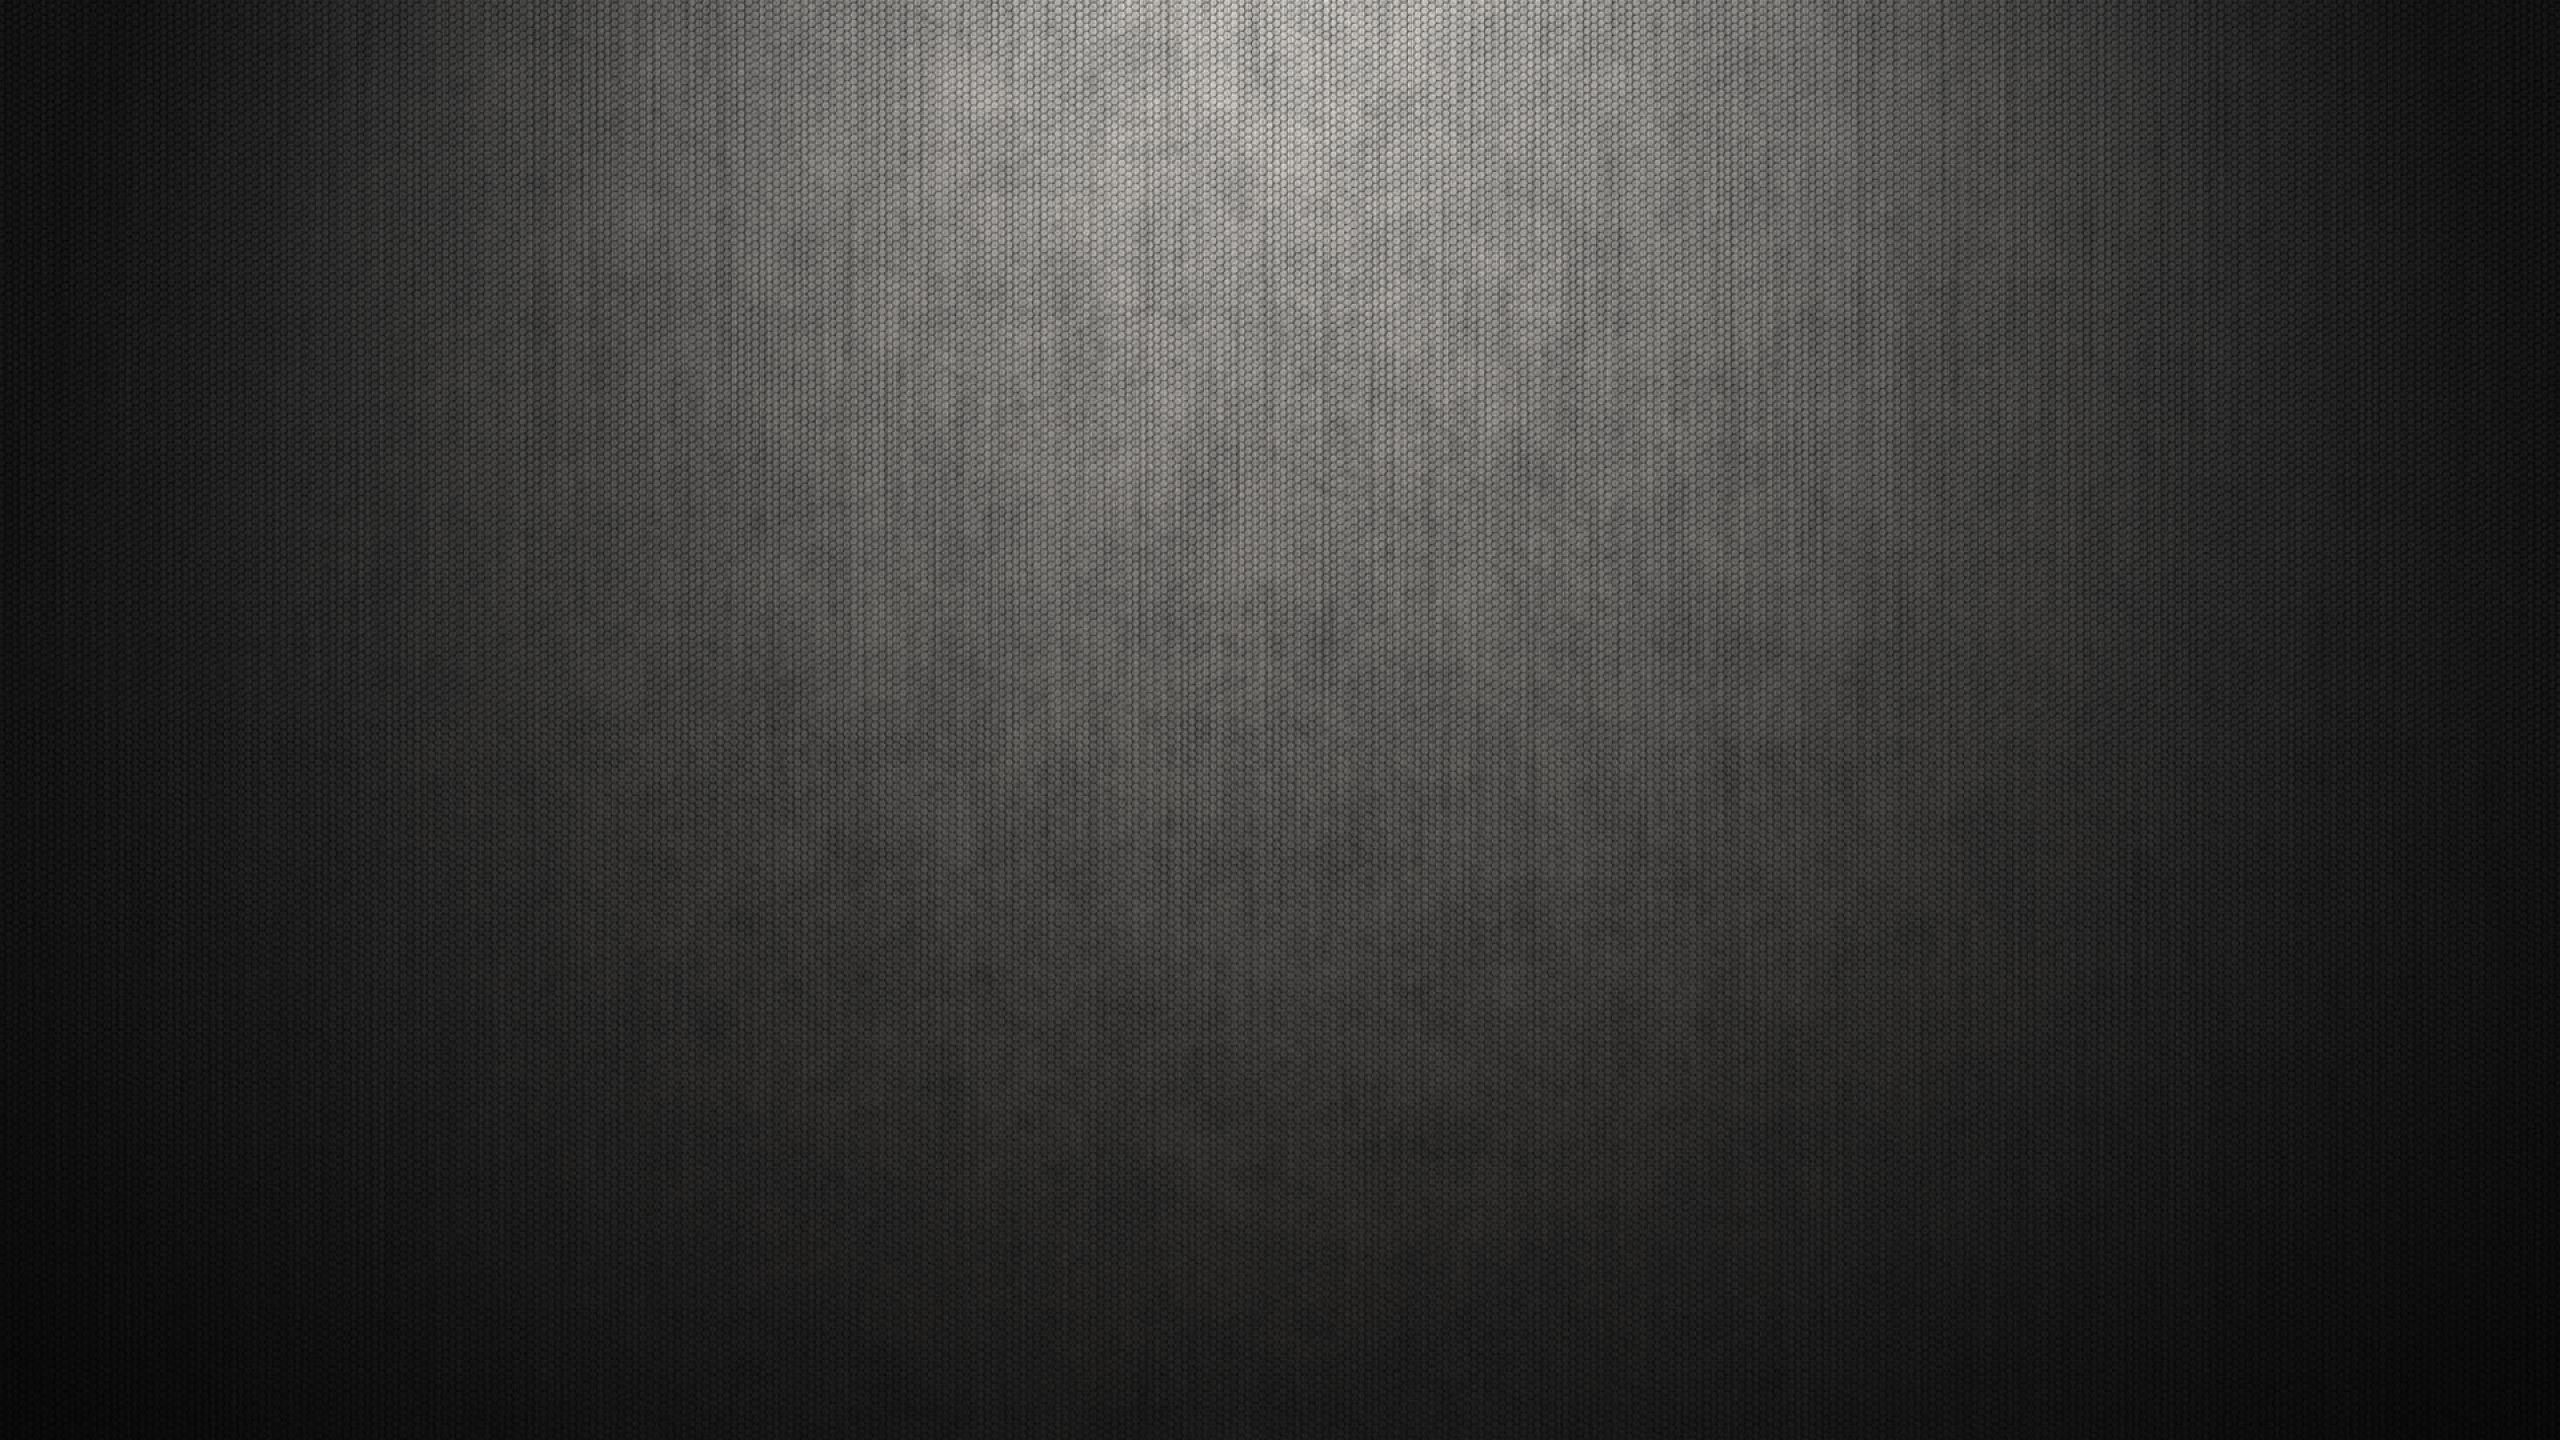 2560x1440 Wallpaper Gray Black Shadow Surface Line